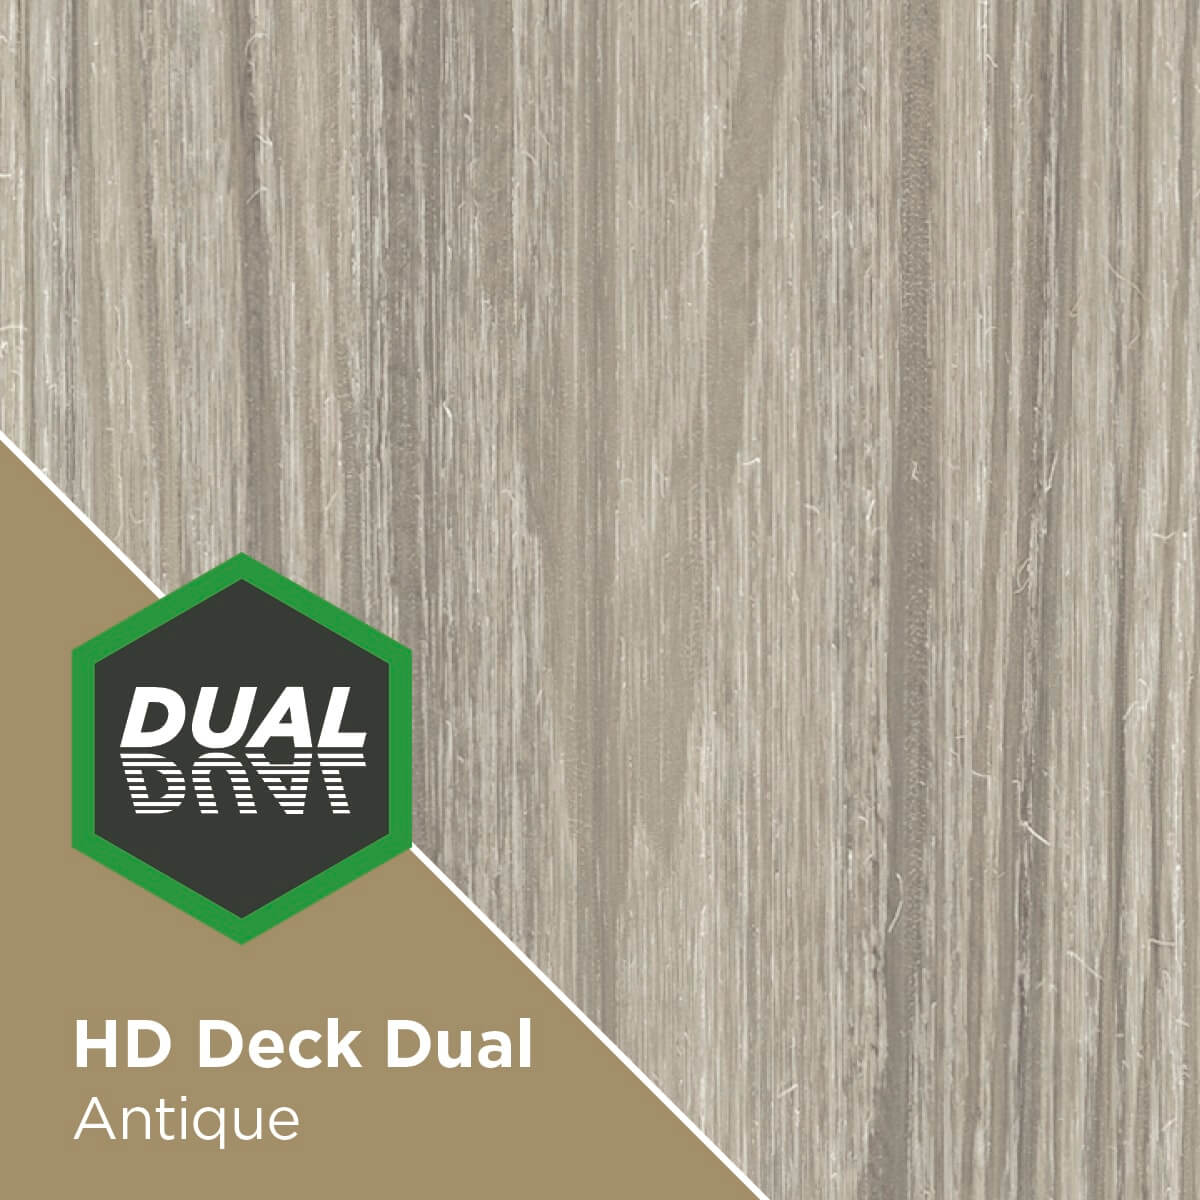 HD Deck Dual Antique